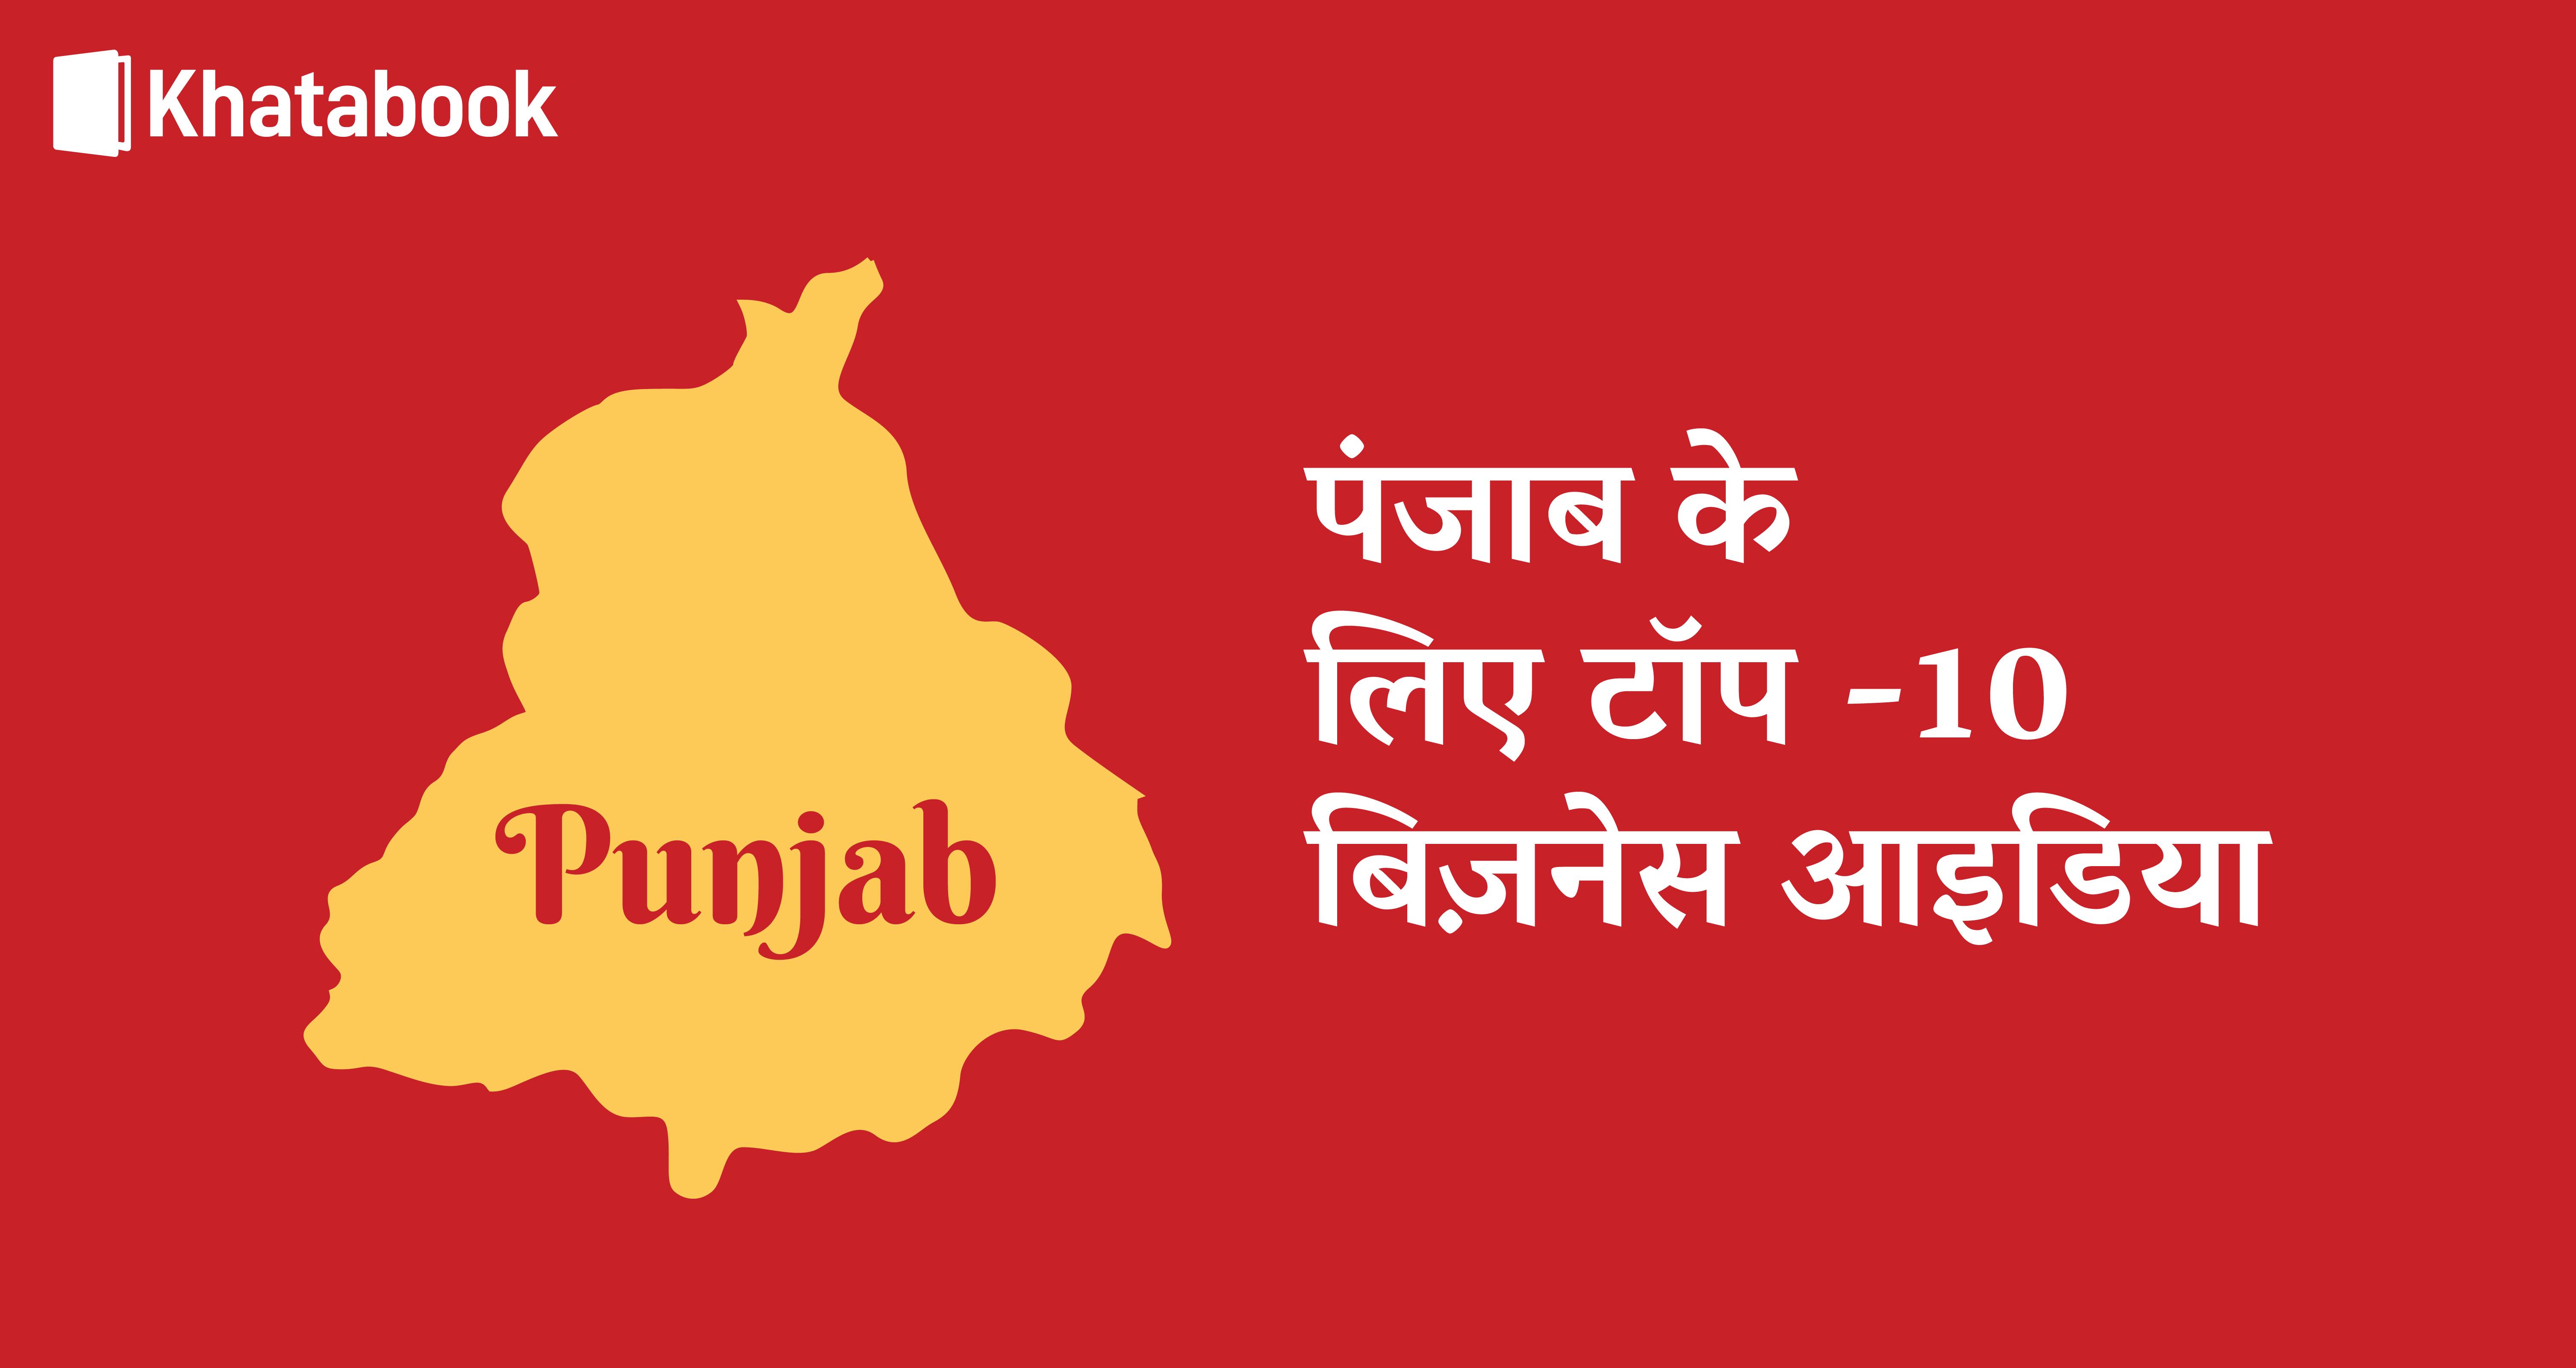 punjab top 10 business ideas